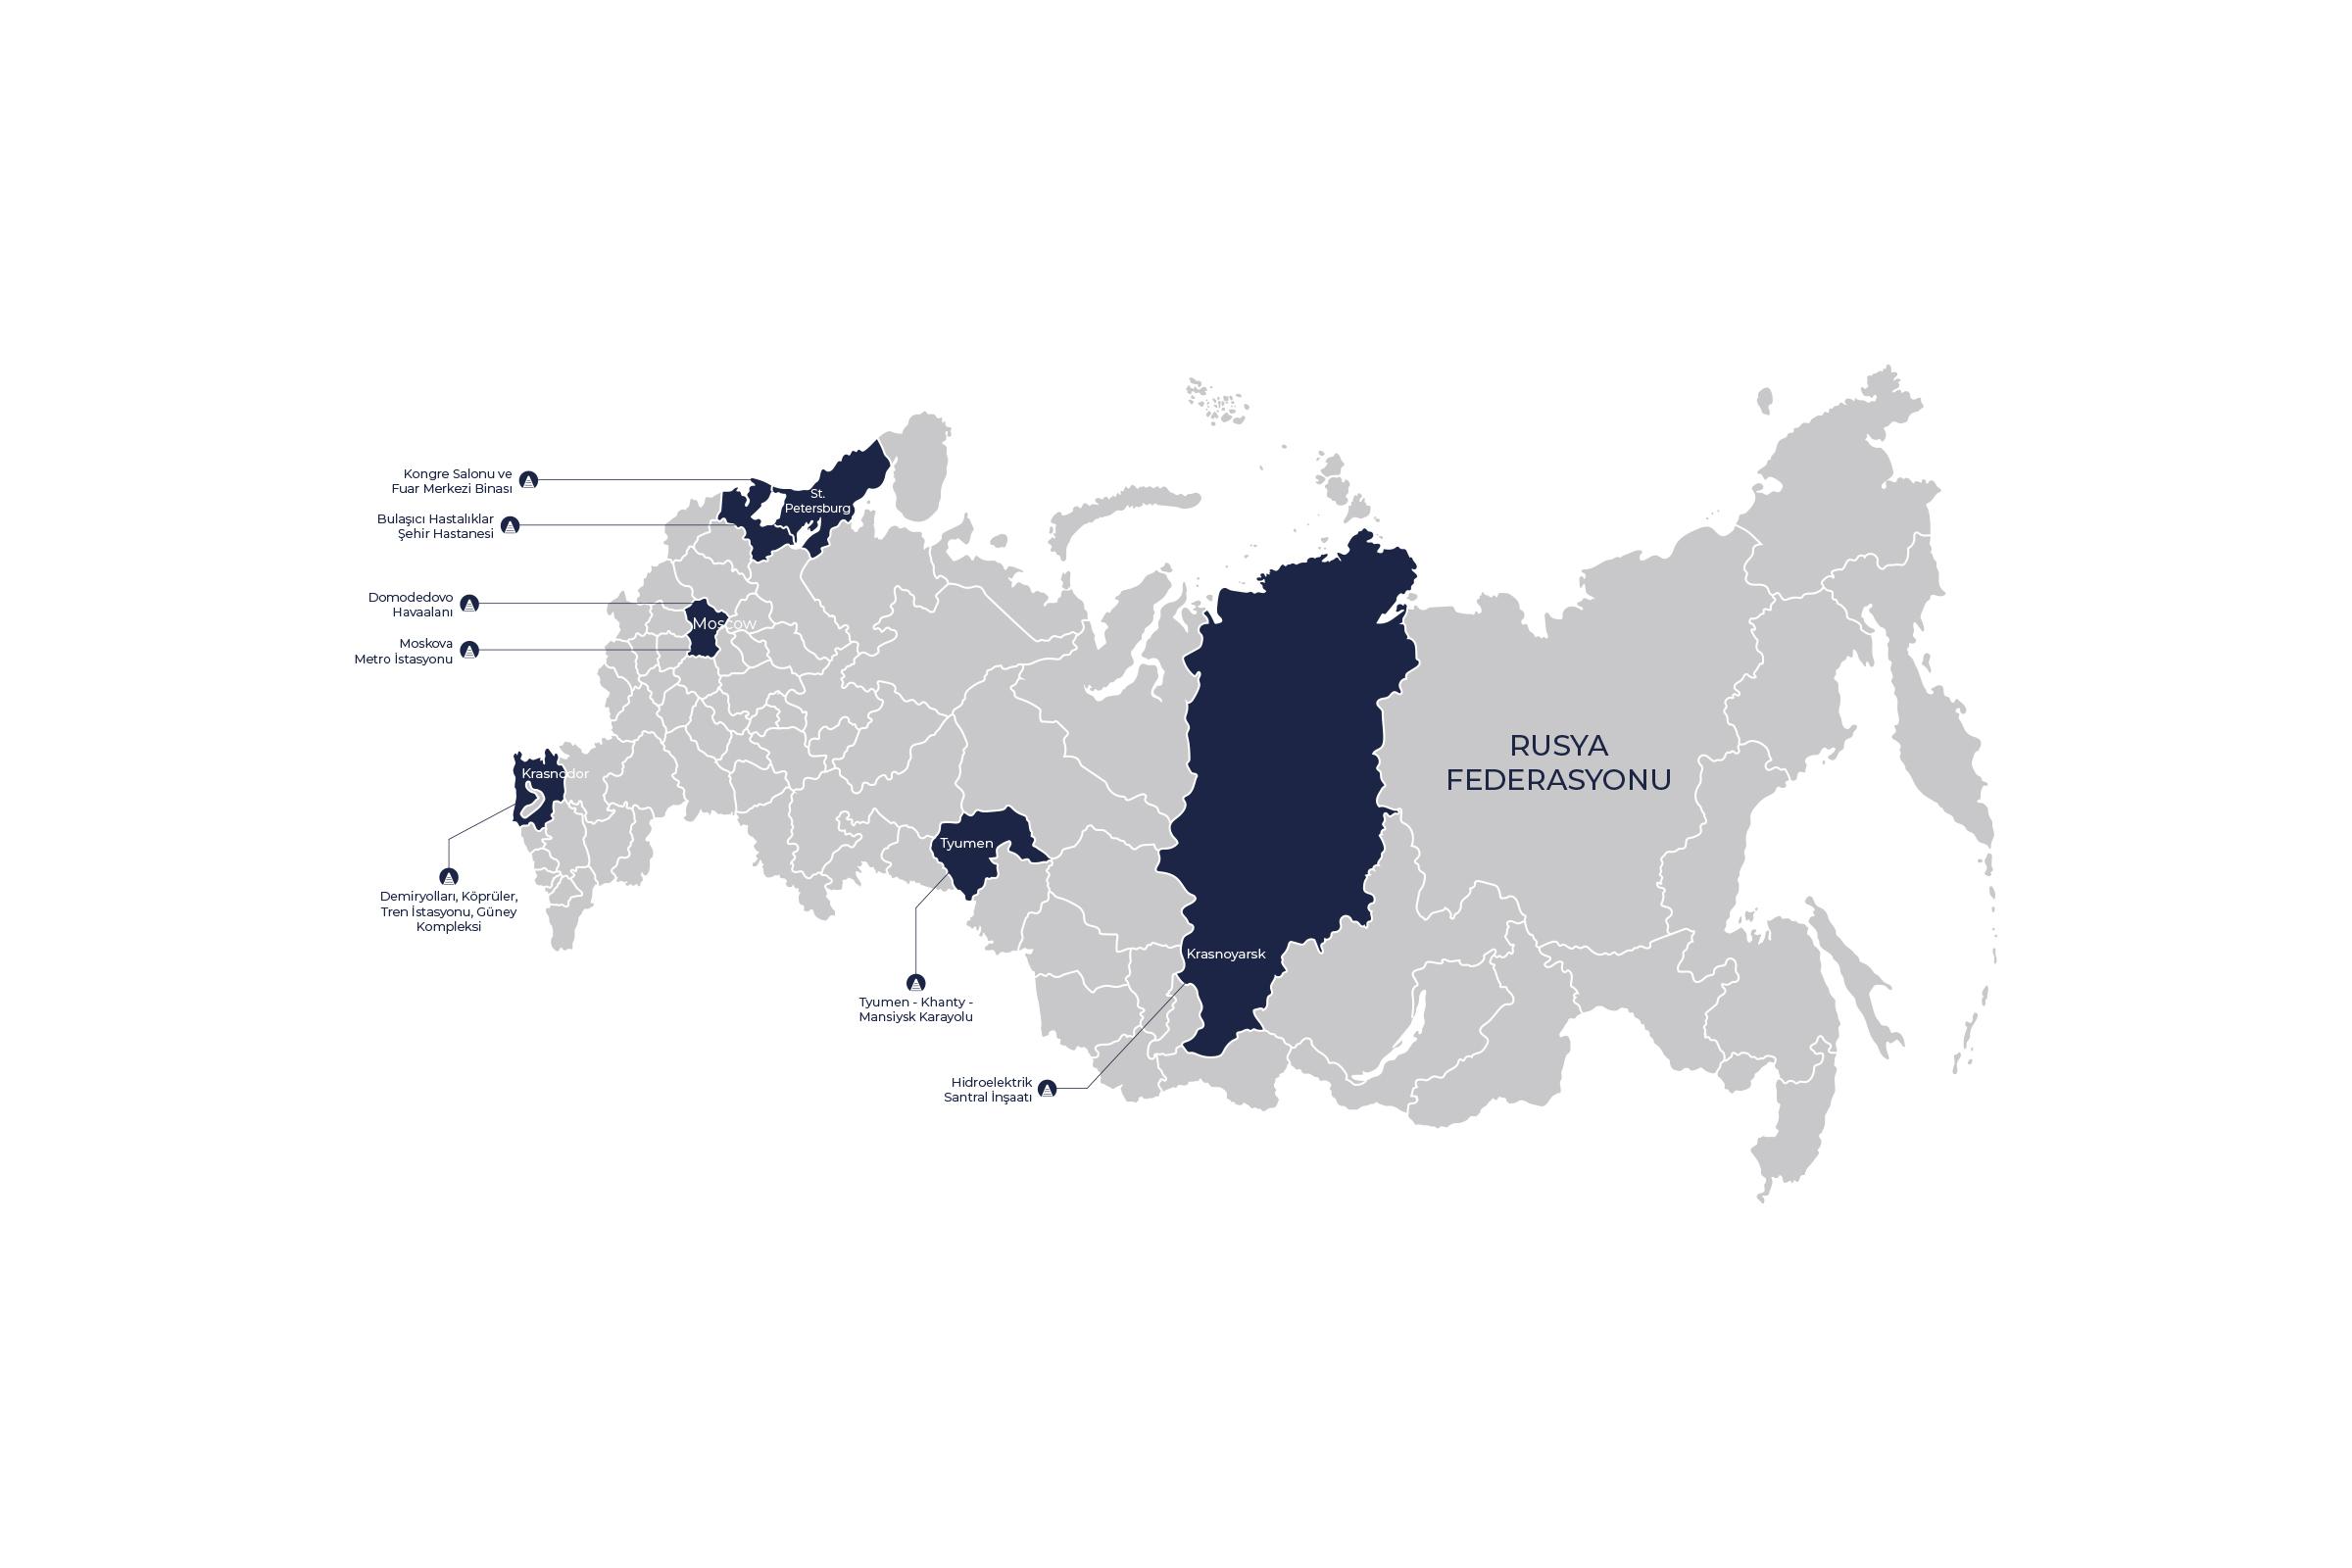 rusya proje tamamlanan tr